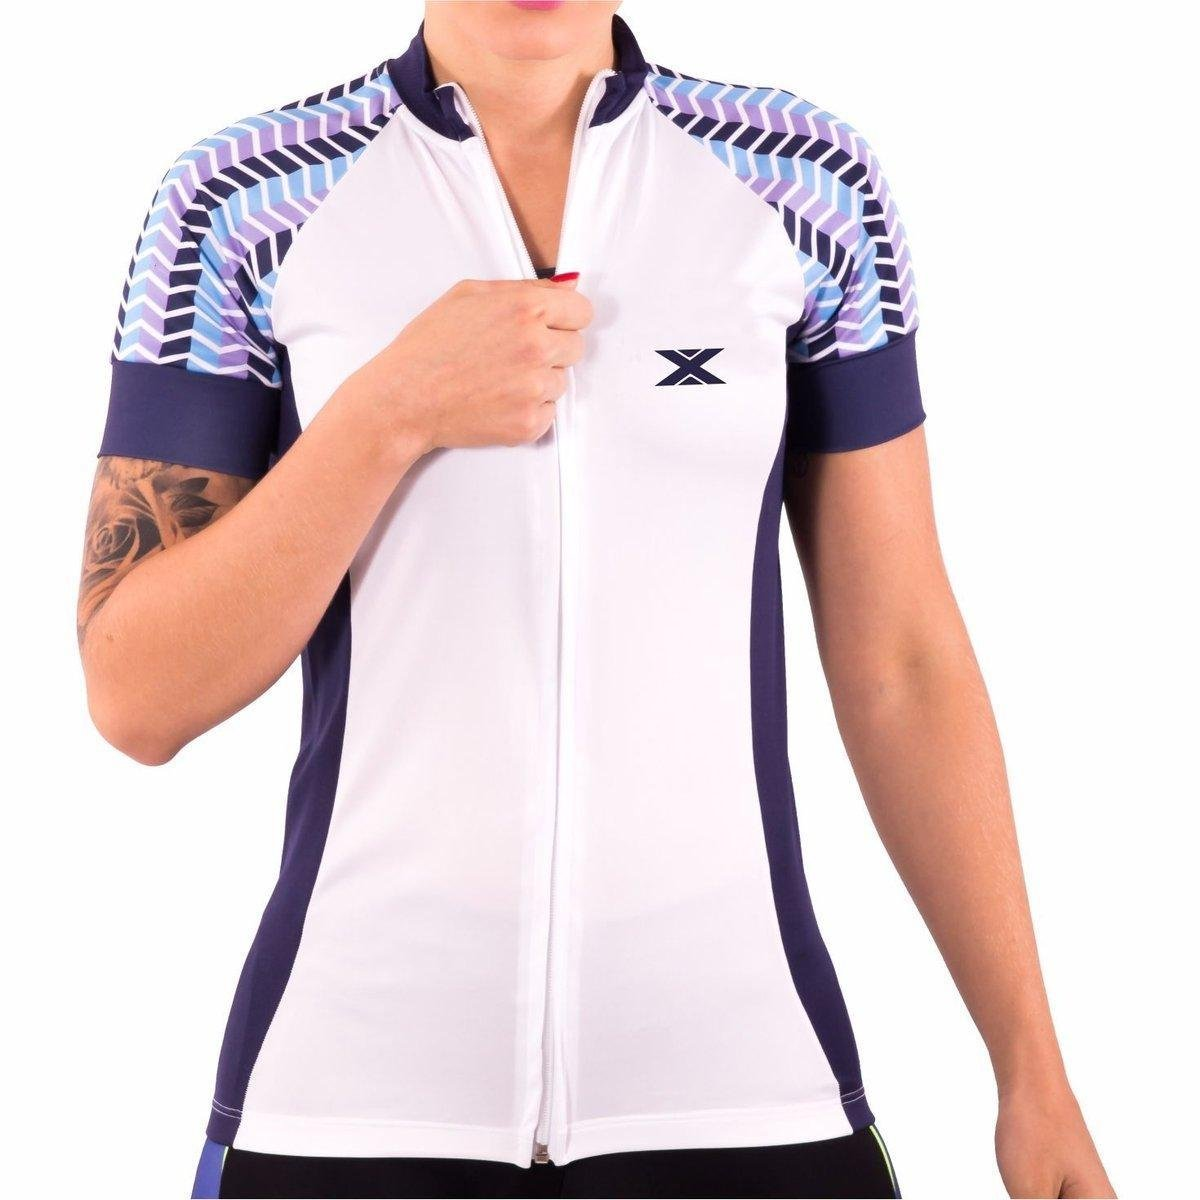 DX3 Ciclismo 81011 Camisa Camisa XPOWER Feminina Branco DX3 qgvvBwf